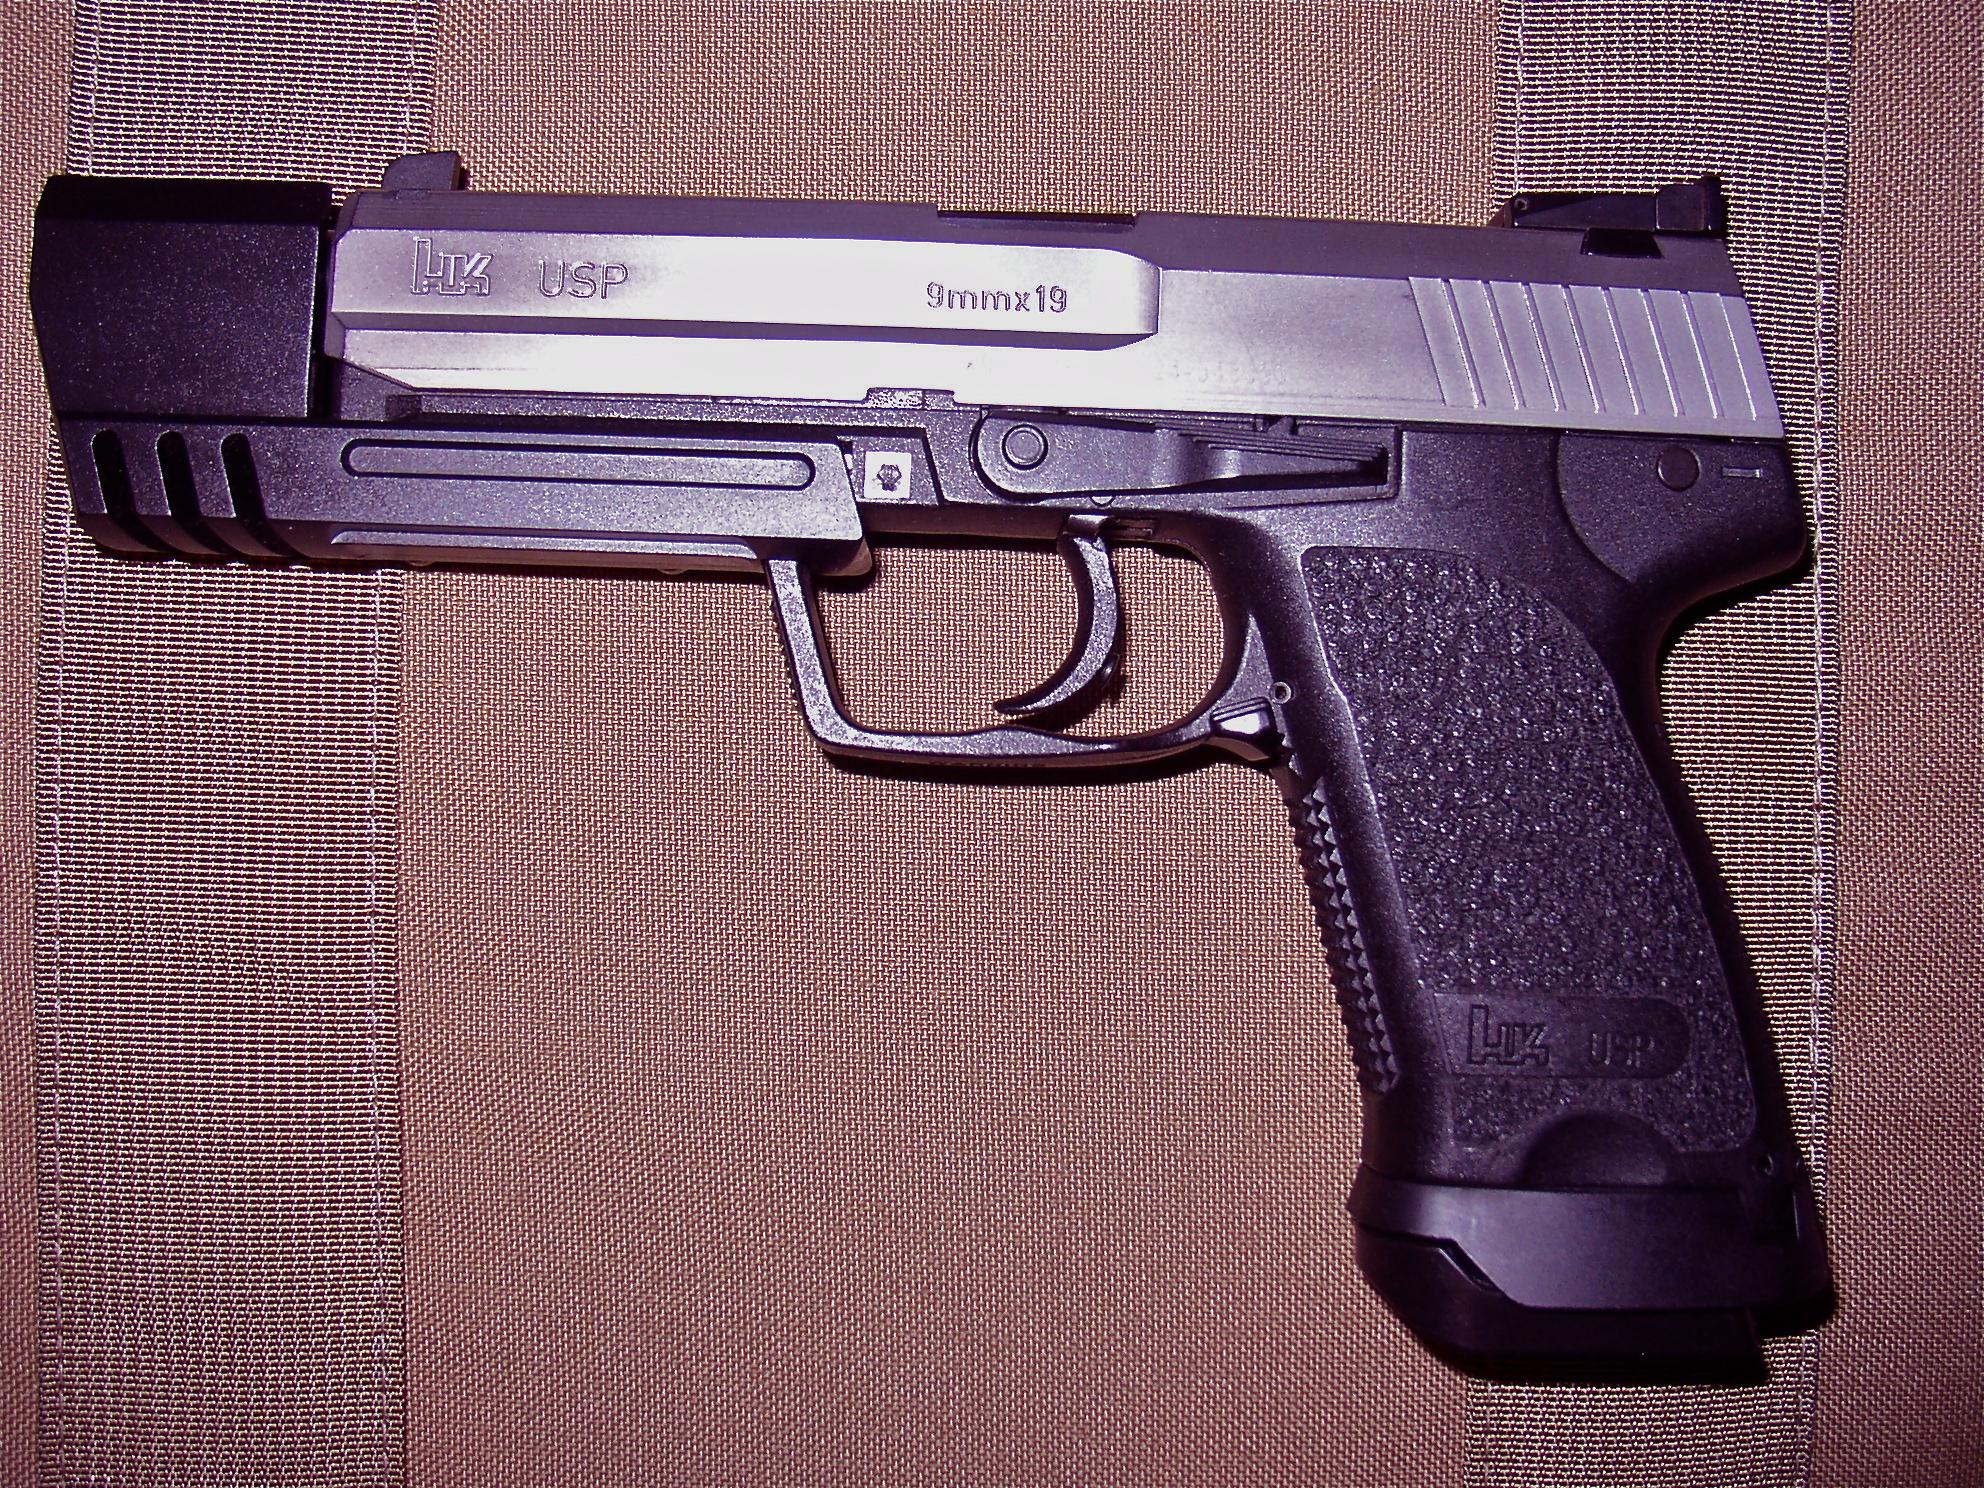 Match USP 9mm Hybrid Clone-p1010478.jpg